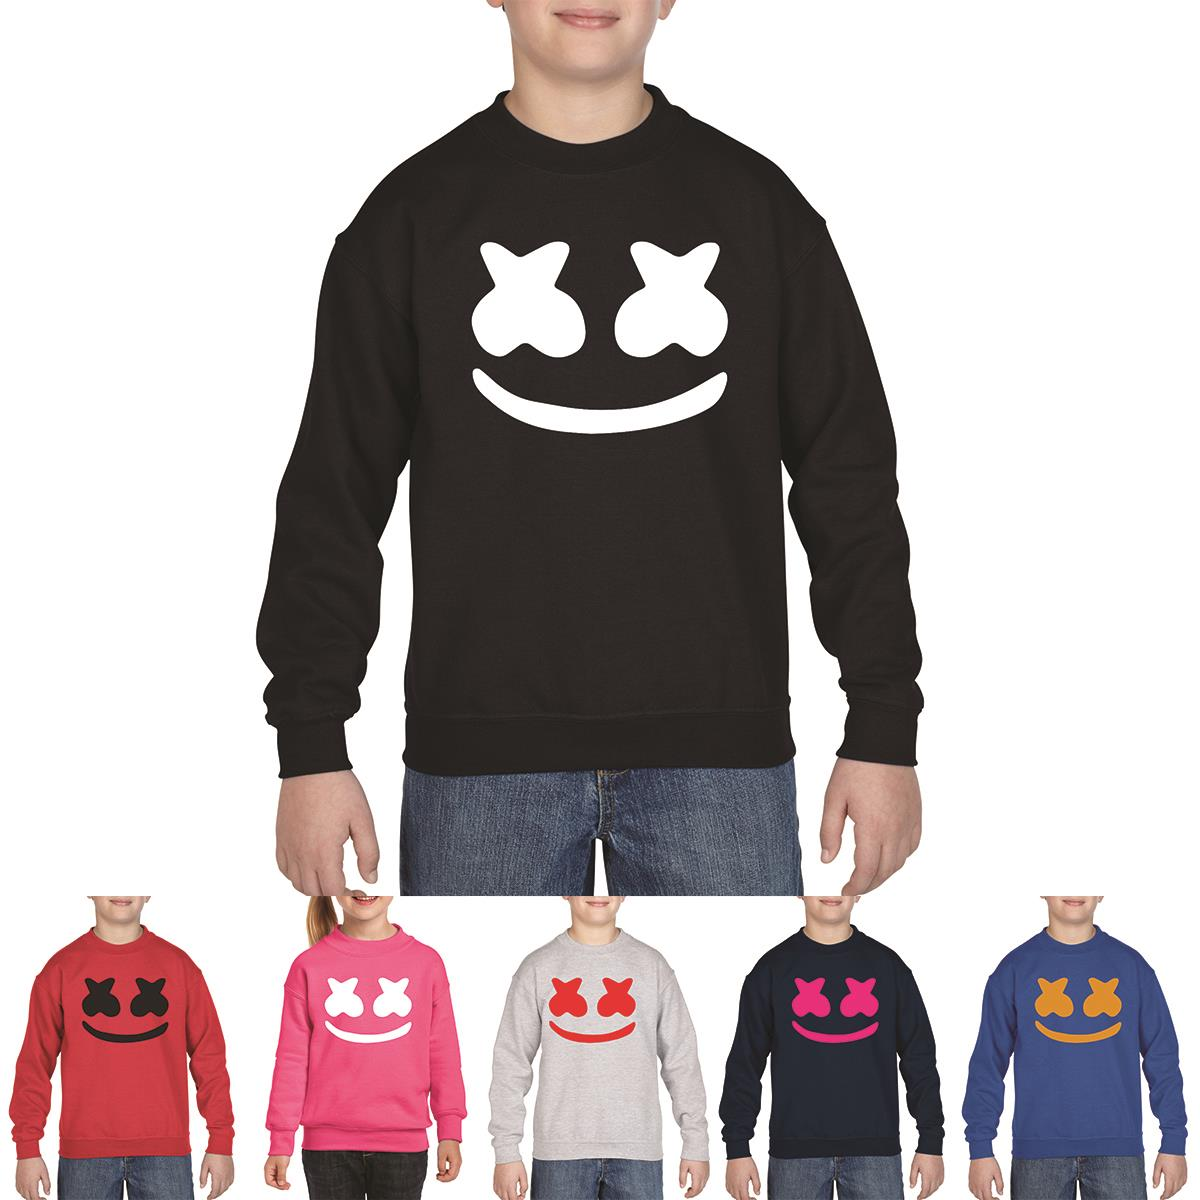 Marshmello Gaming Dance DJ Youtube EDM Festival Mask Youth Sweat Shirt Gift